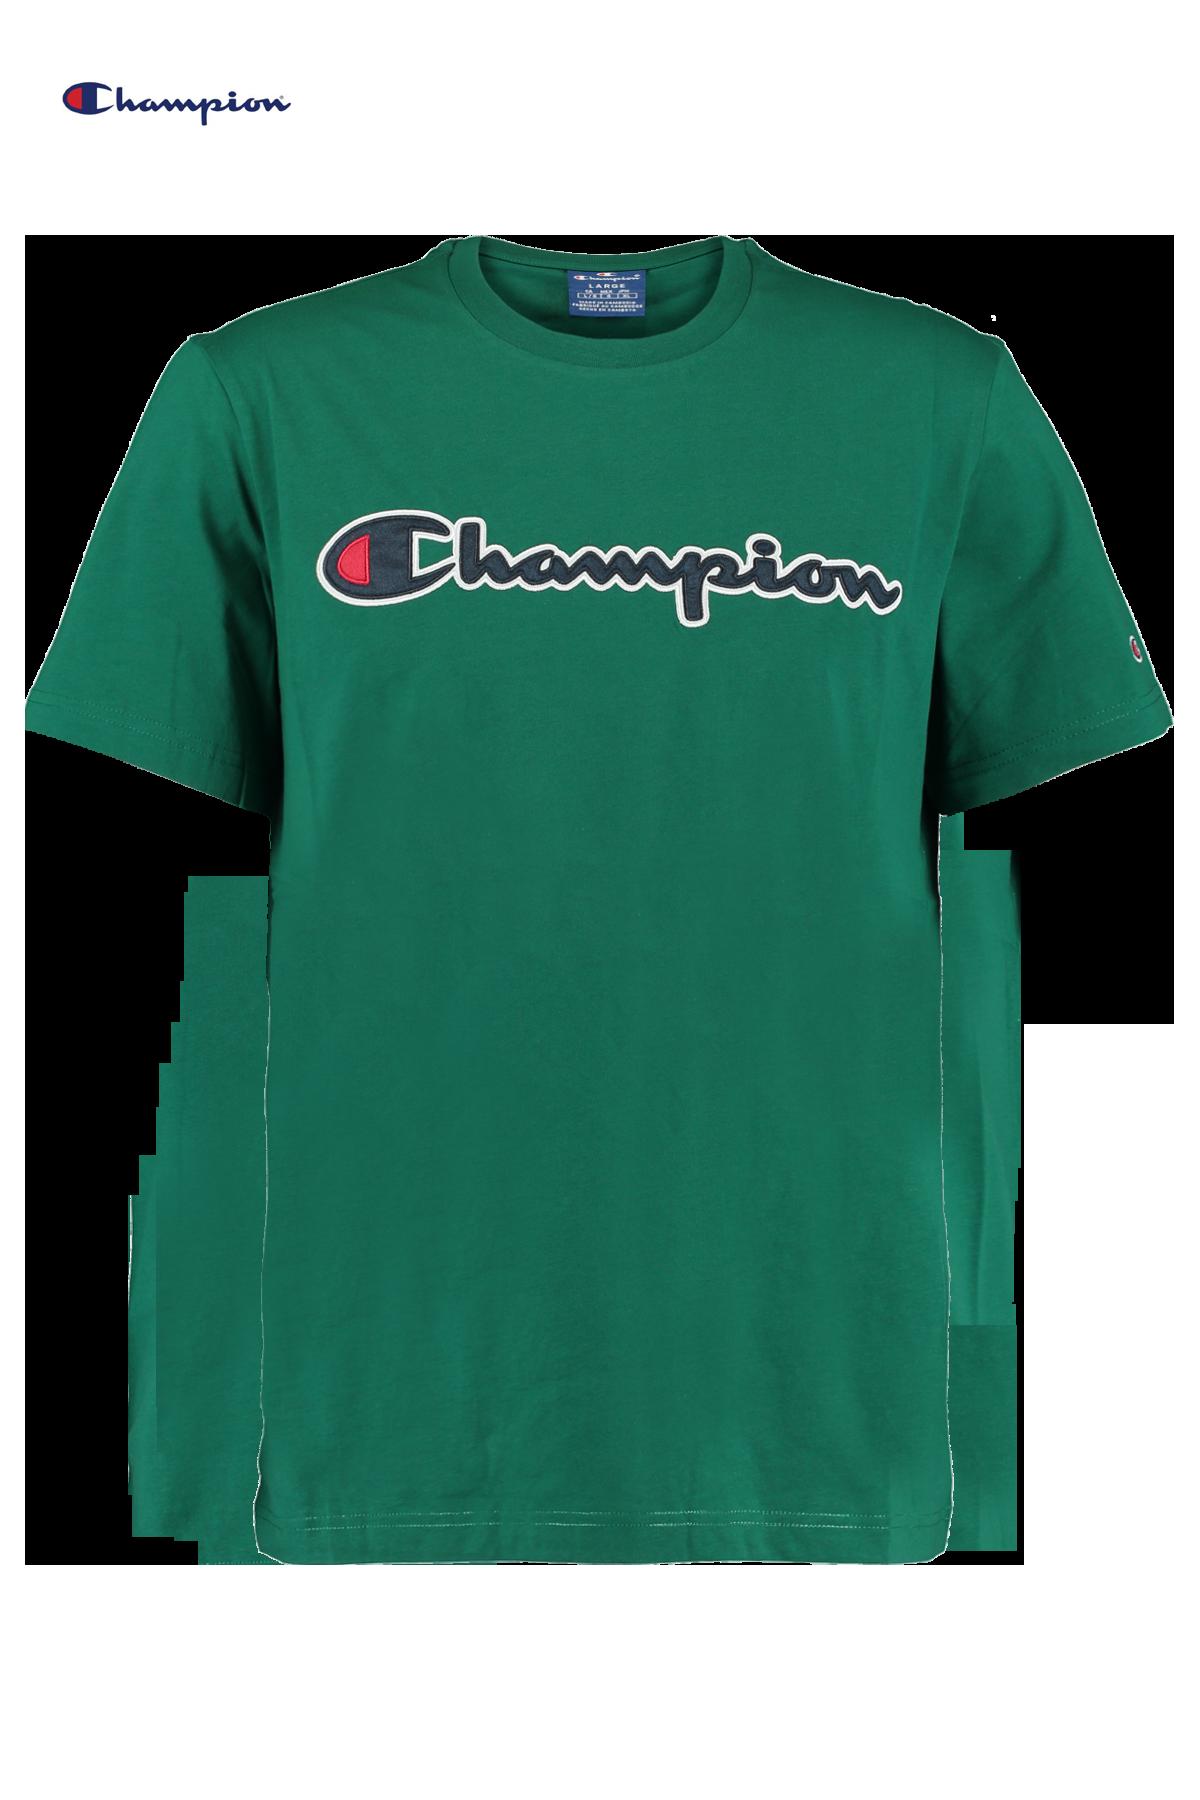 T-shirt T-shirts s/s Men Co